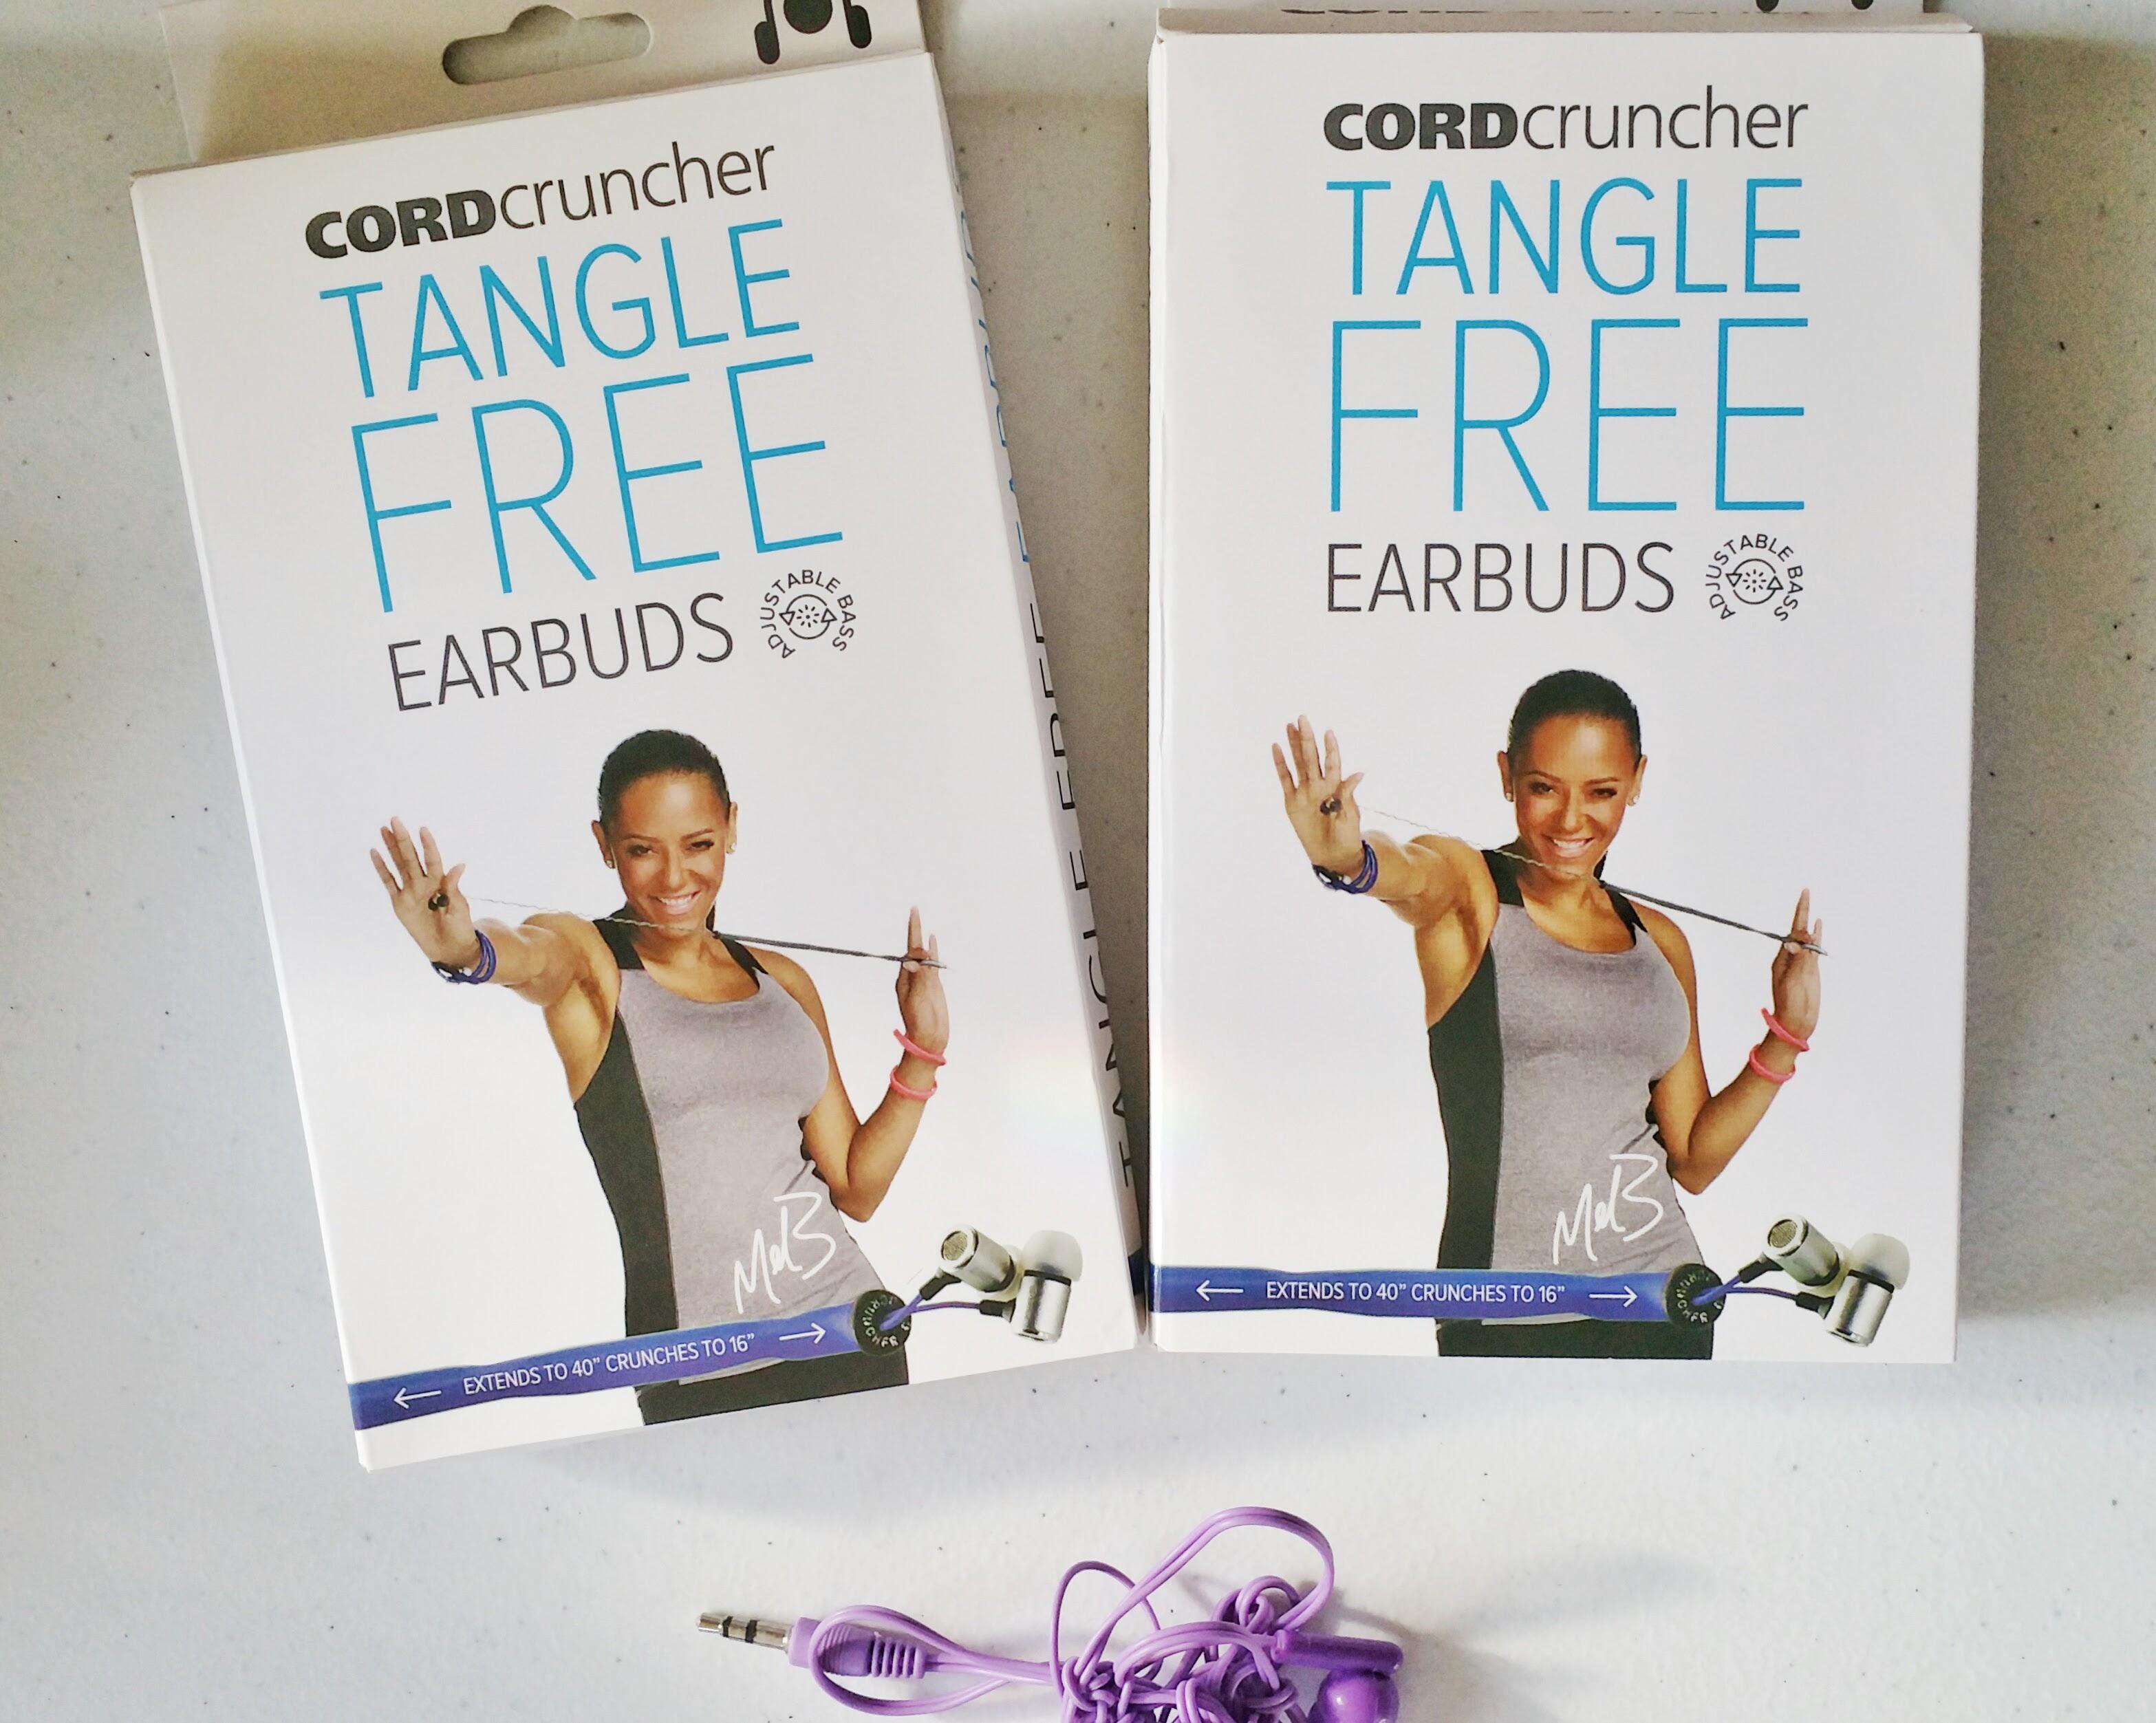 CordCruncher, Tangle free headphones, headphones, tech gear, tech gadgets, gadgets, review, product review, electronics, mel b,